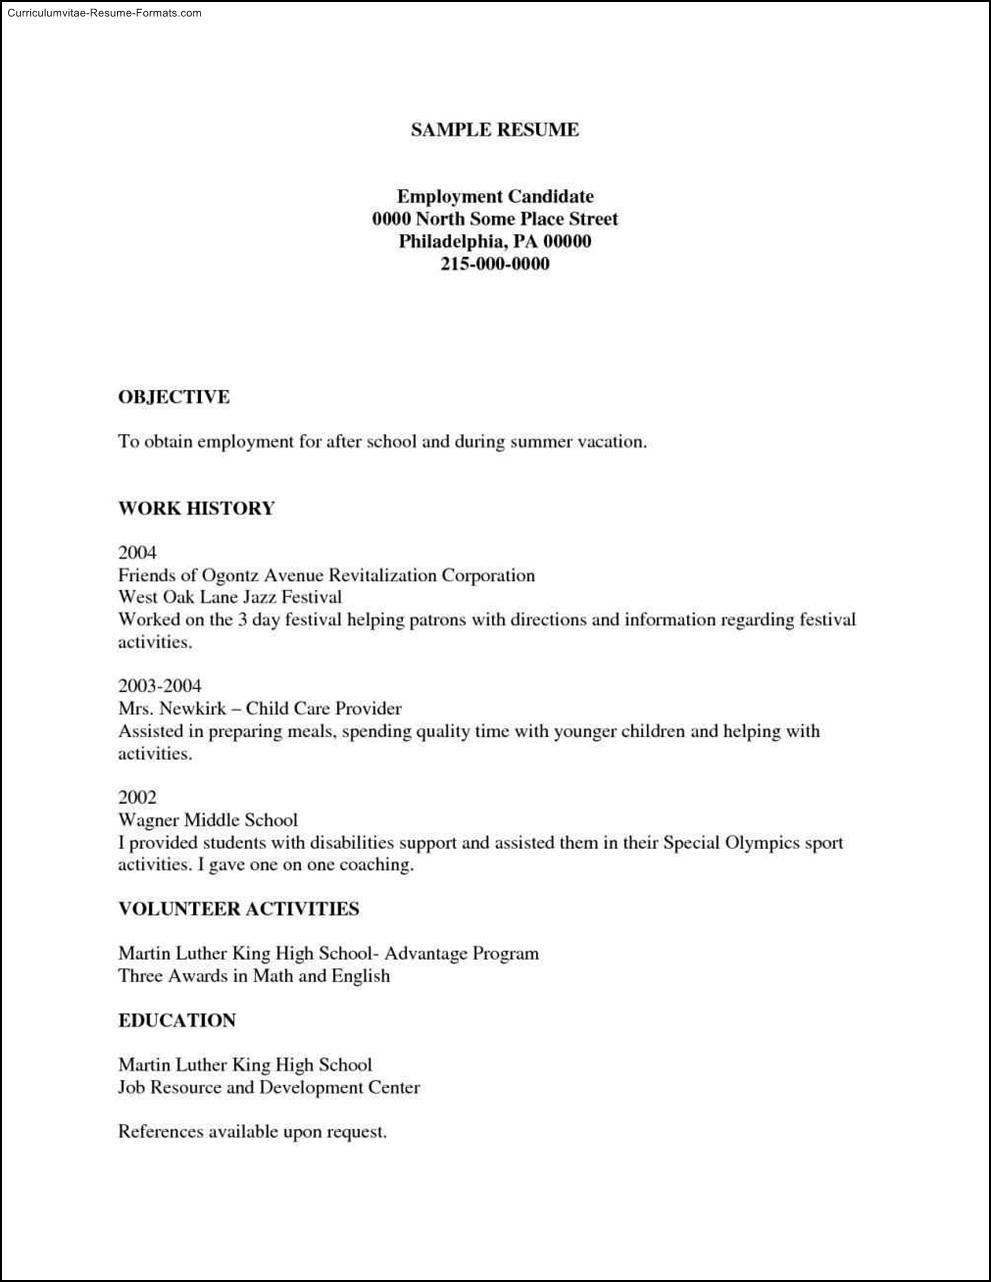 Free Printable Resumes Templates  Free Samples  Examples  Format Resume  Curruculum Vitae